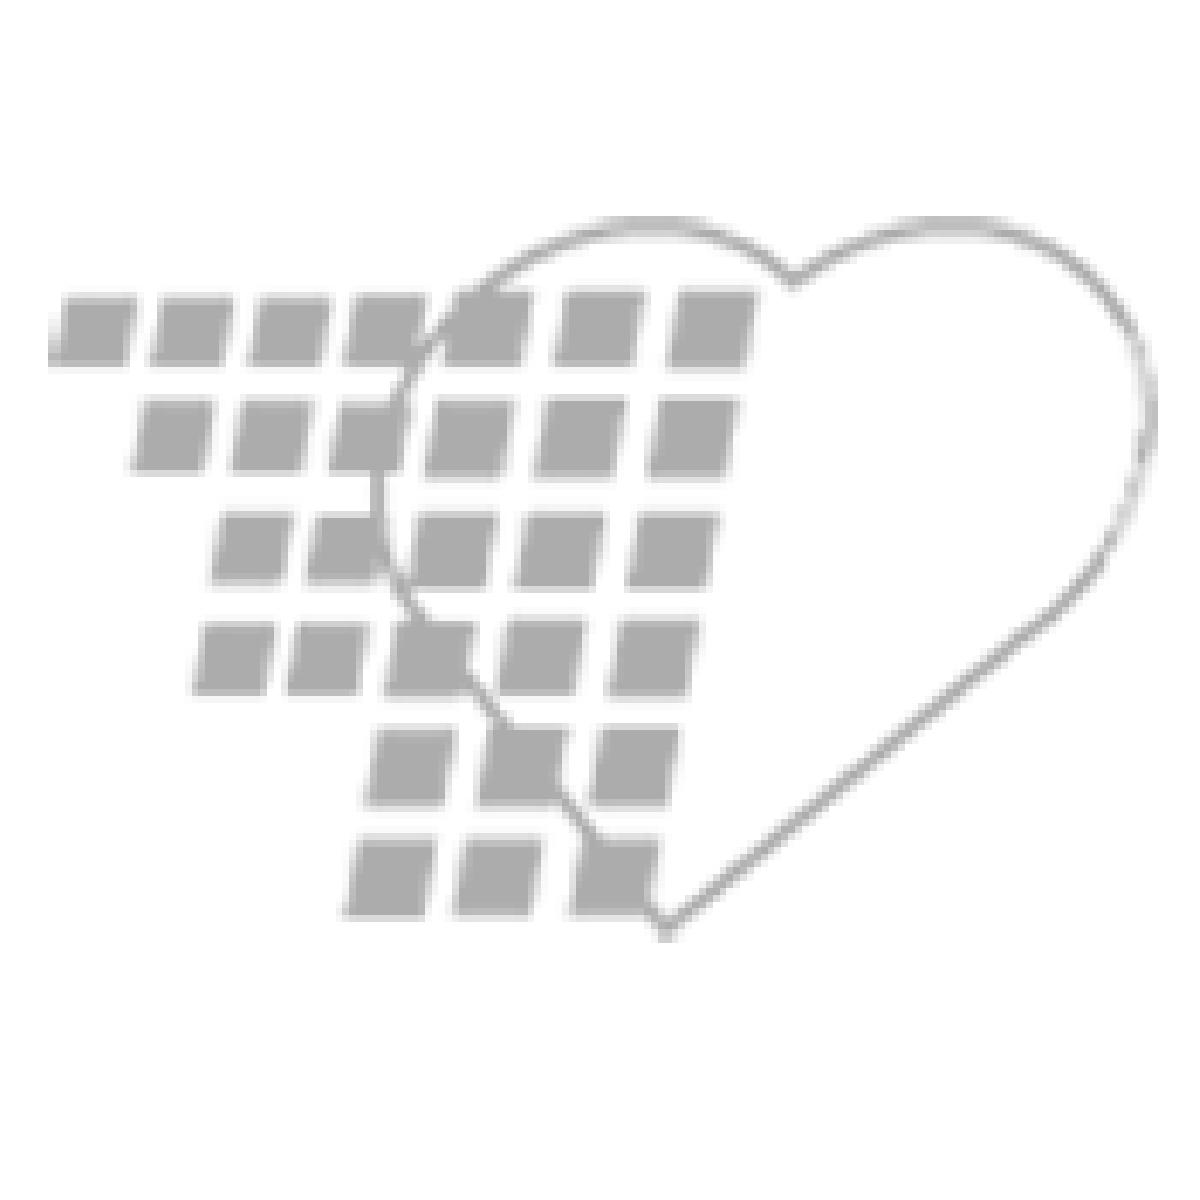 03-47-1040-LG - DermAssist® Sterile Pairs Powder-Free Latex Exam Gloves - Large